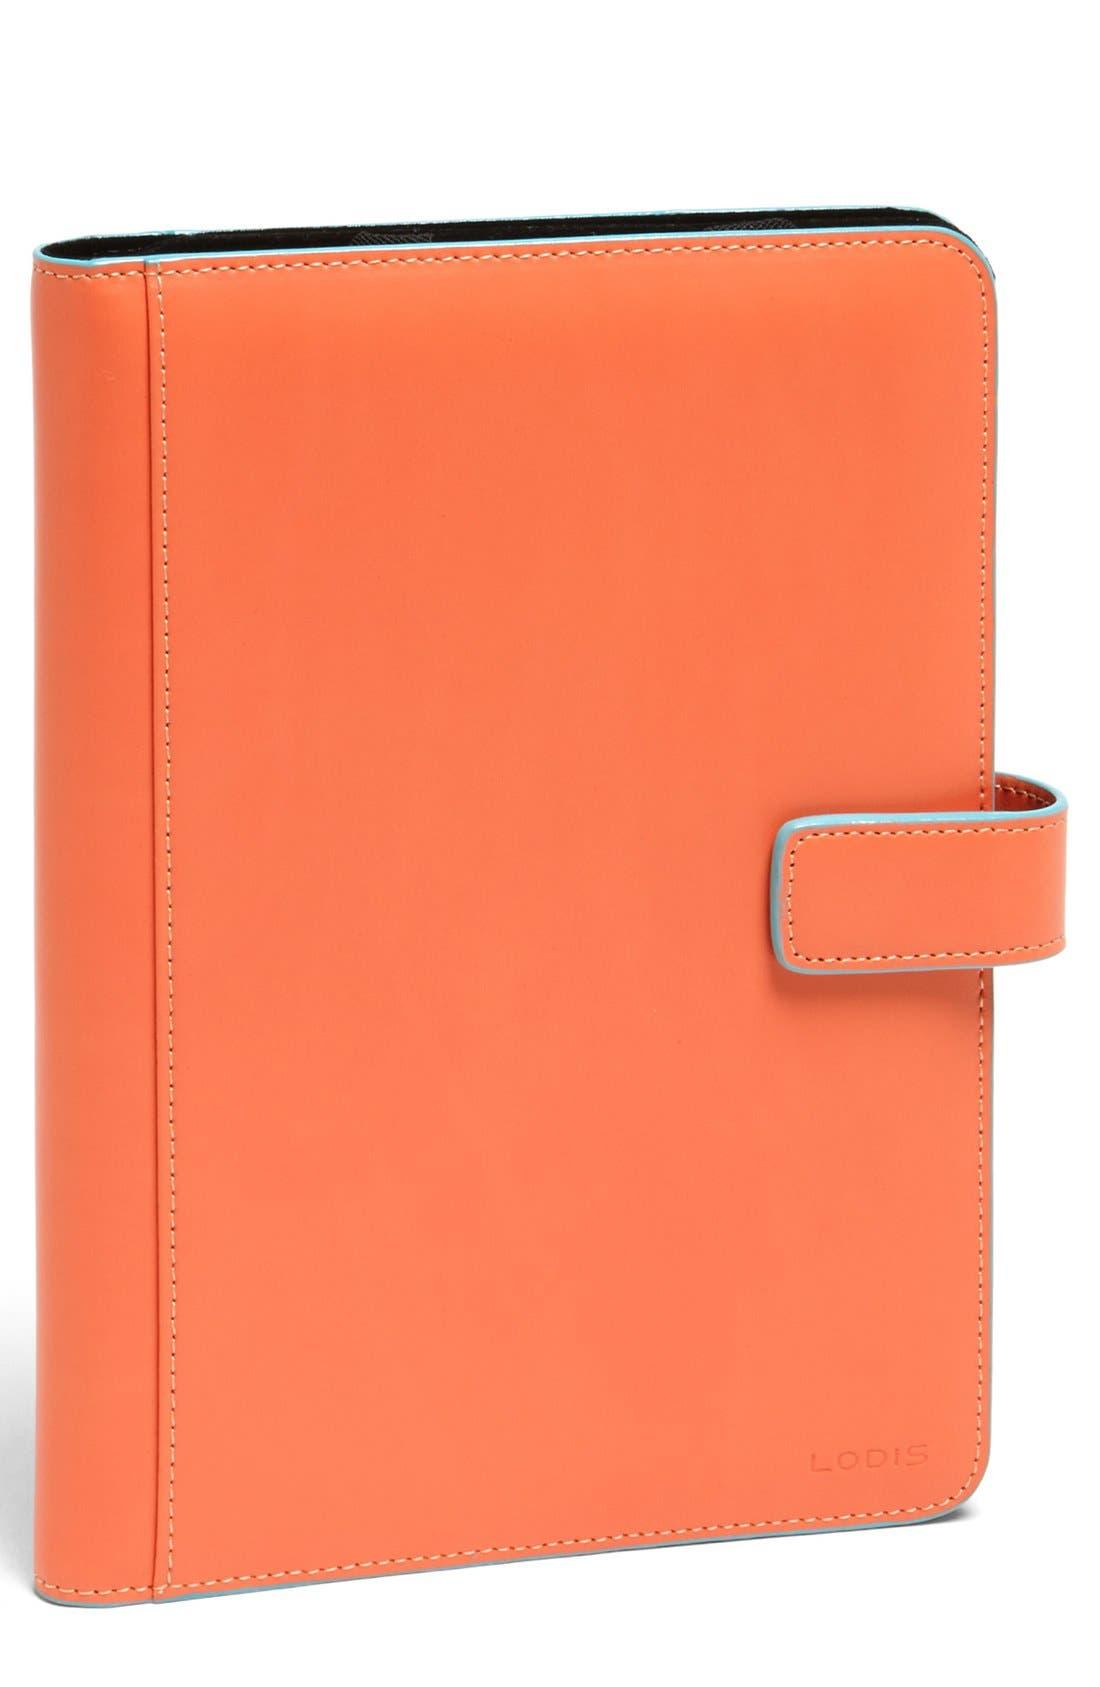 Lodis 'Swivel' iPad mini Case,                             Main thumbnail 1, color,                             Orange